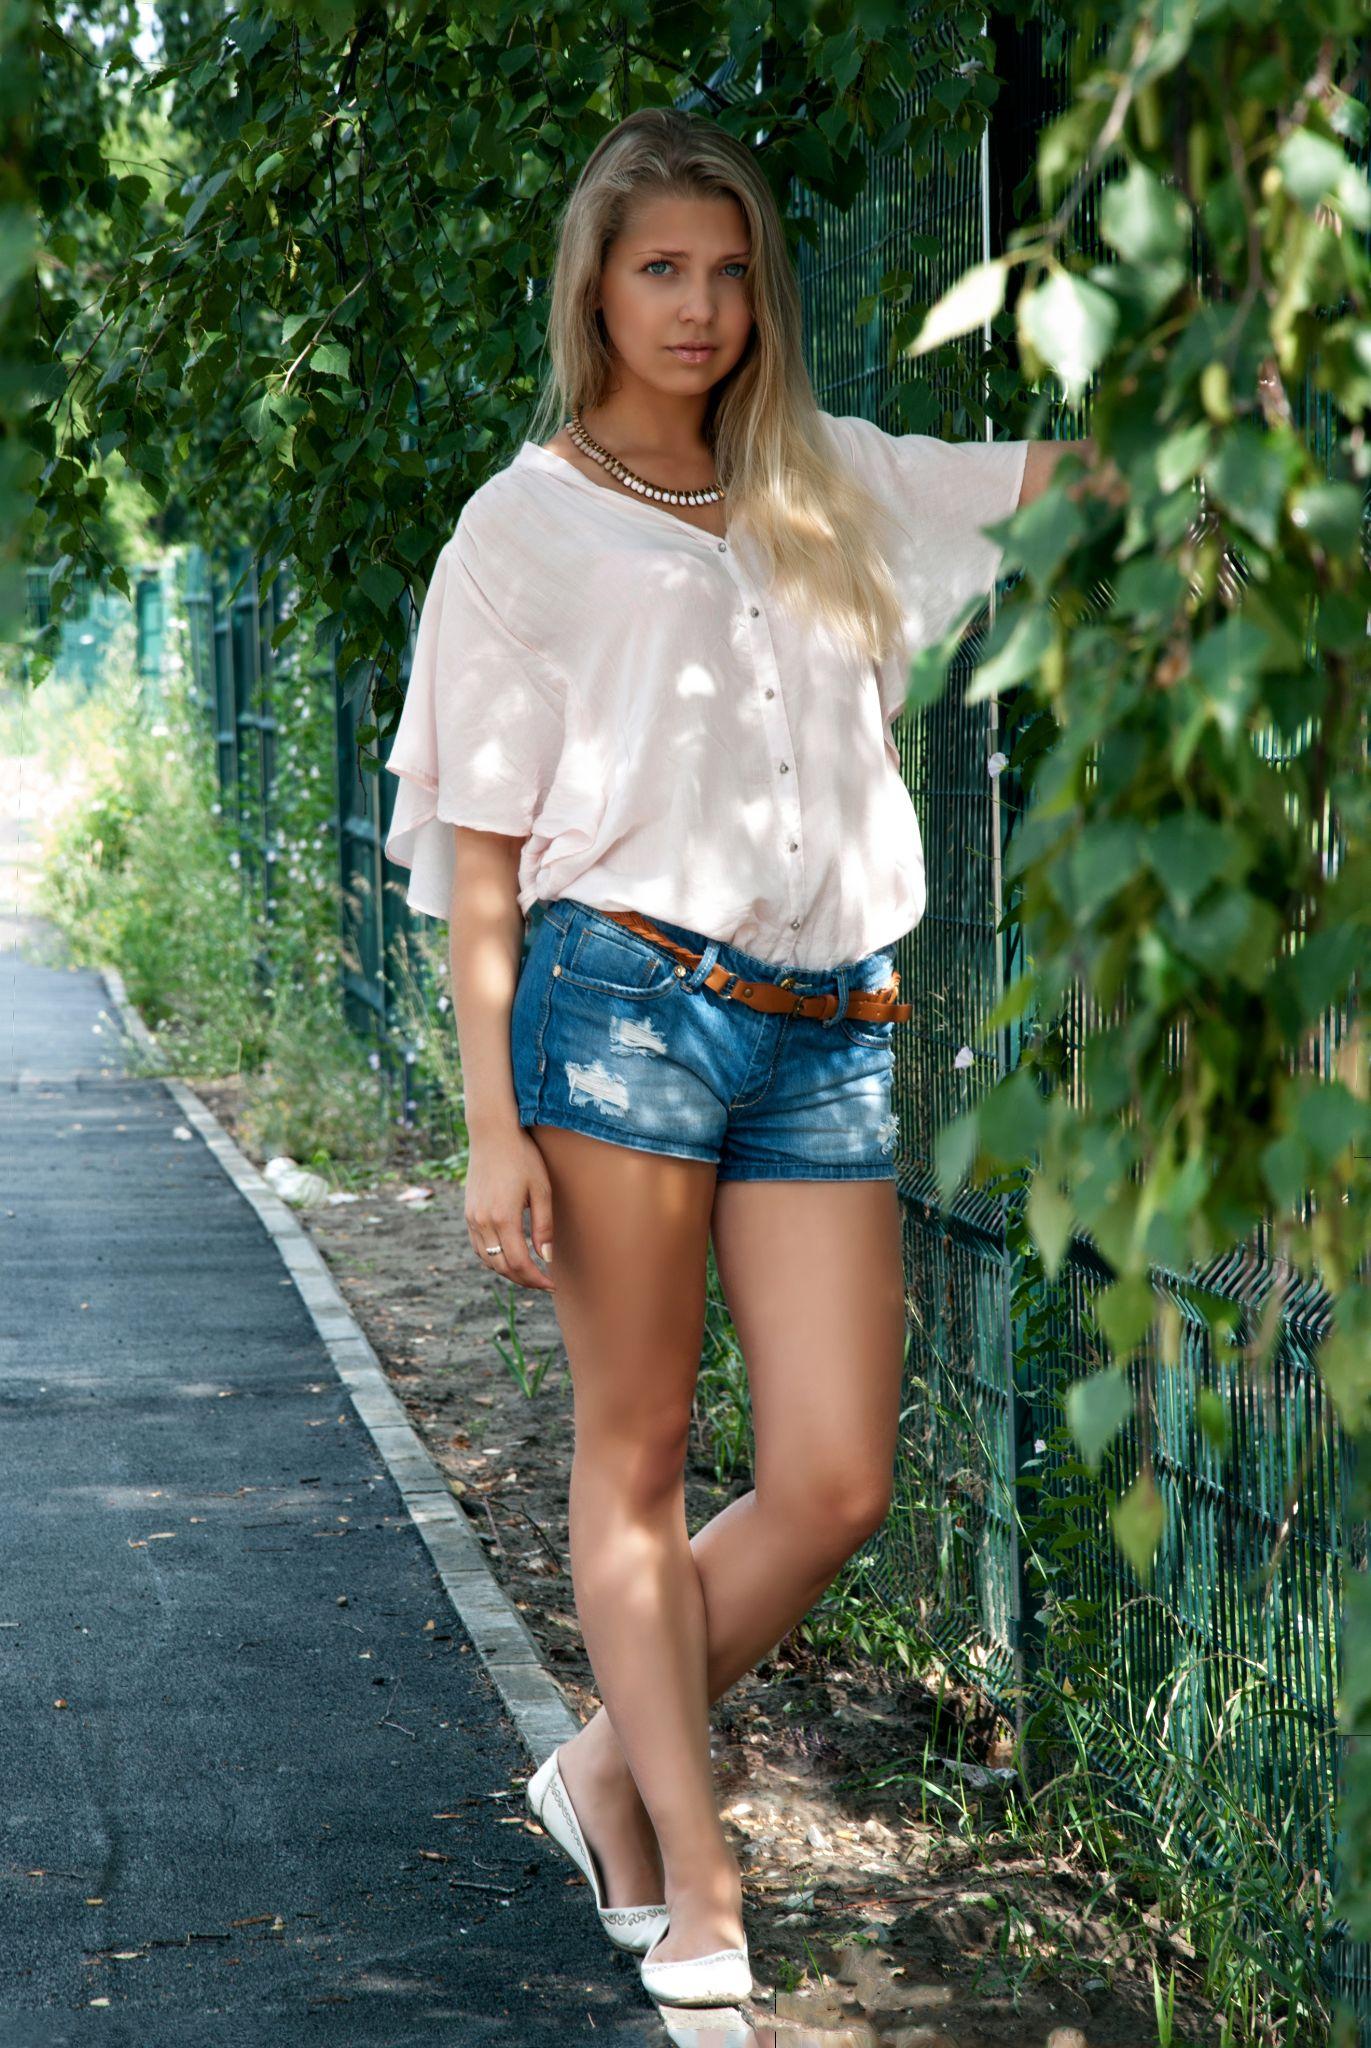 Rita by Sergey